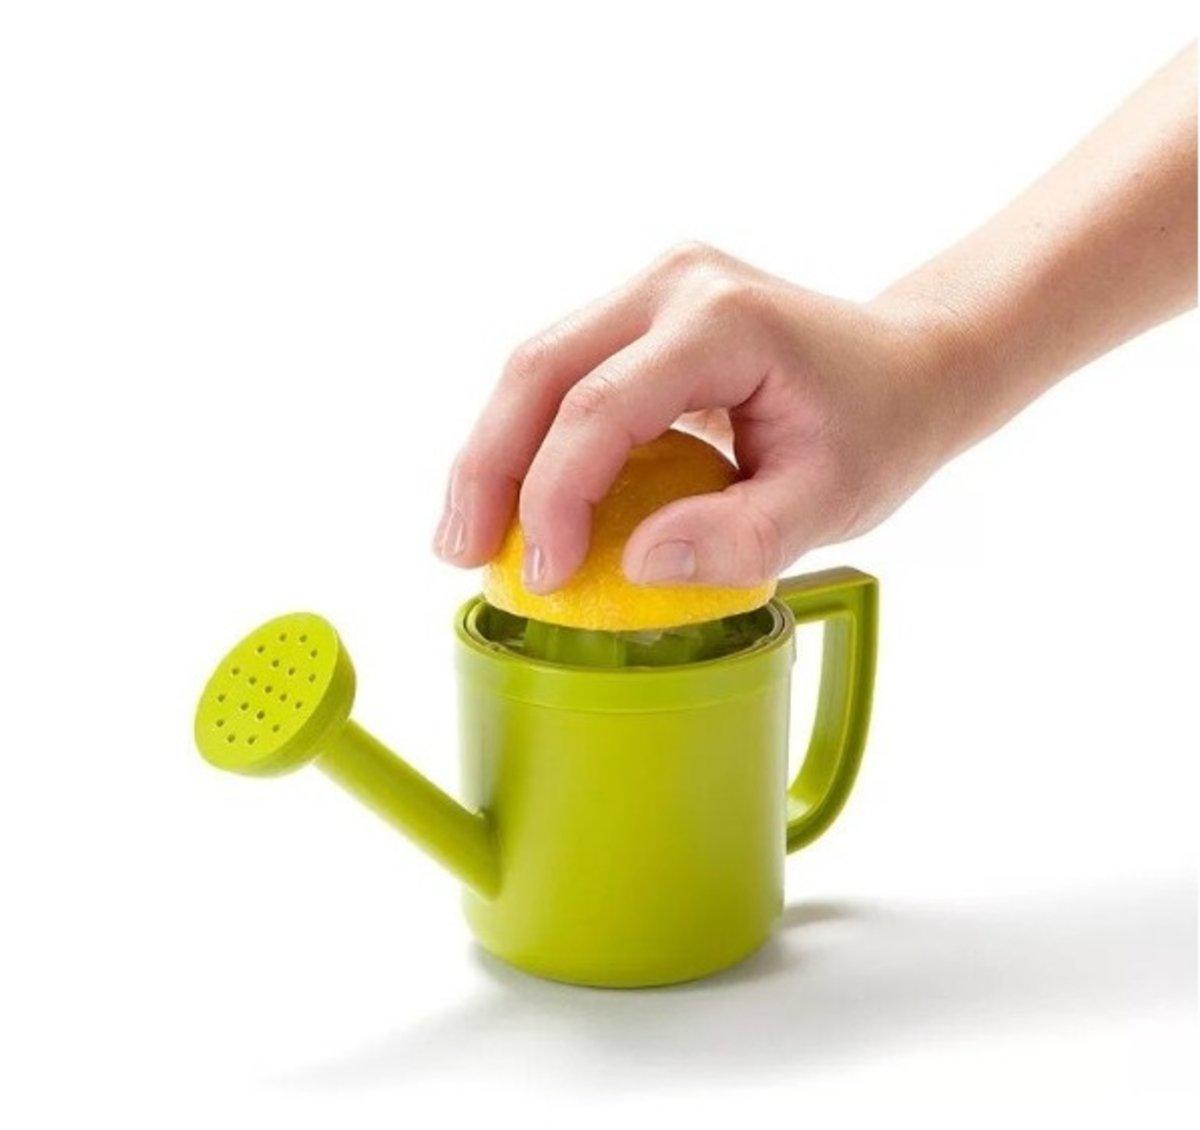 Lemon fruit hand juicing jug